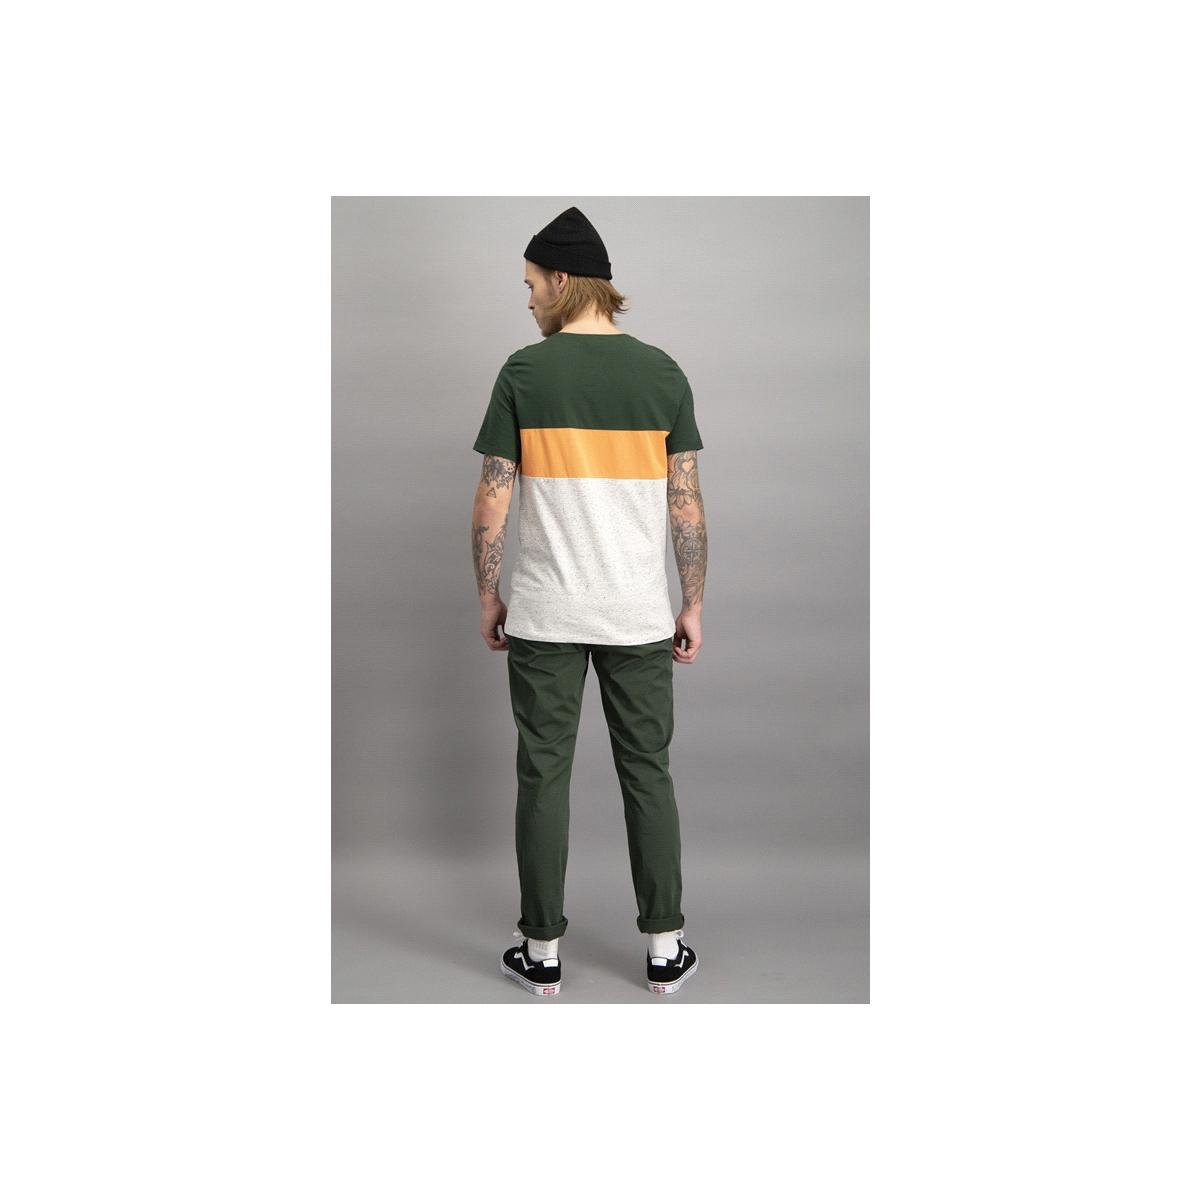 ts rama 1901030229 kultivate t-shirt 203 ecru